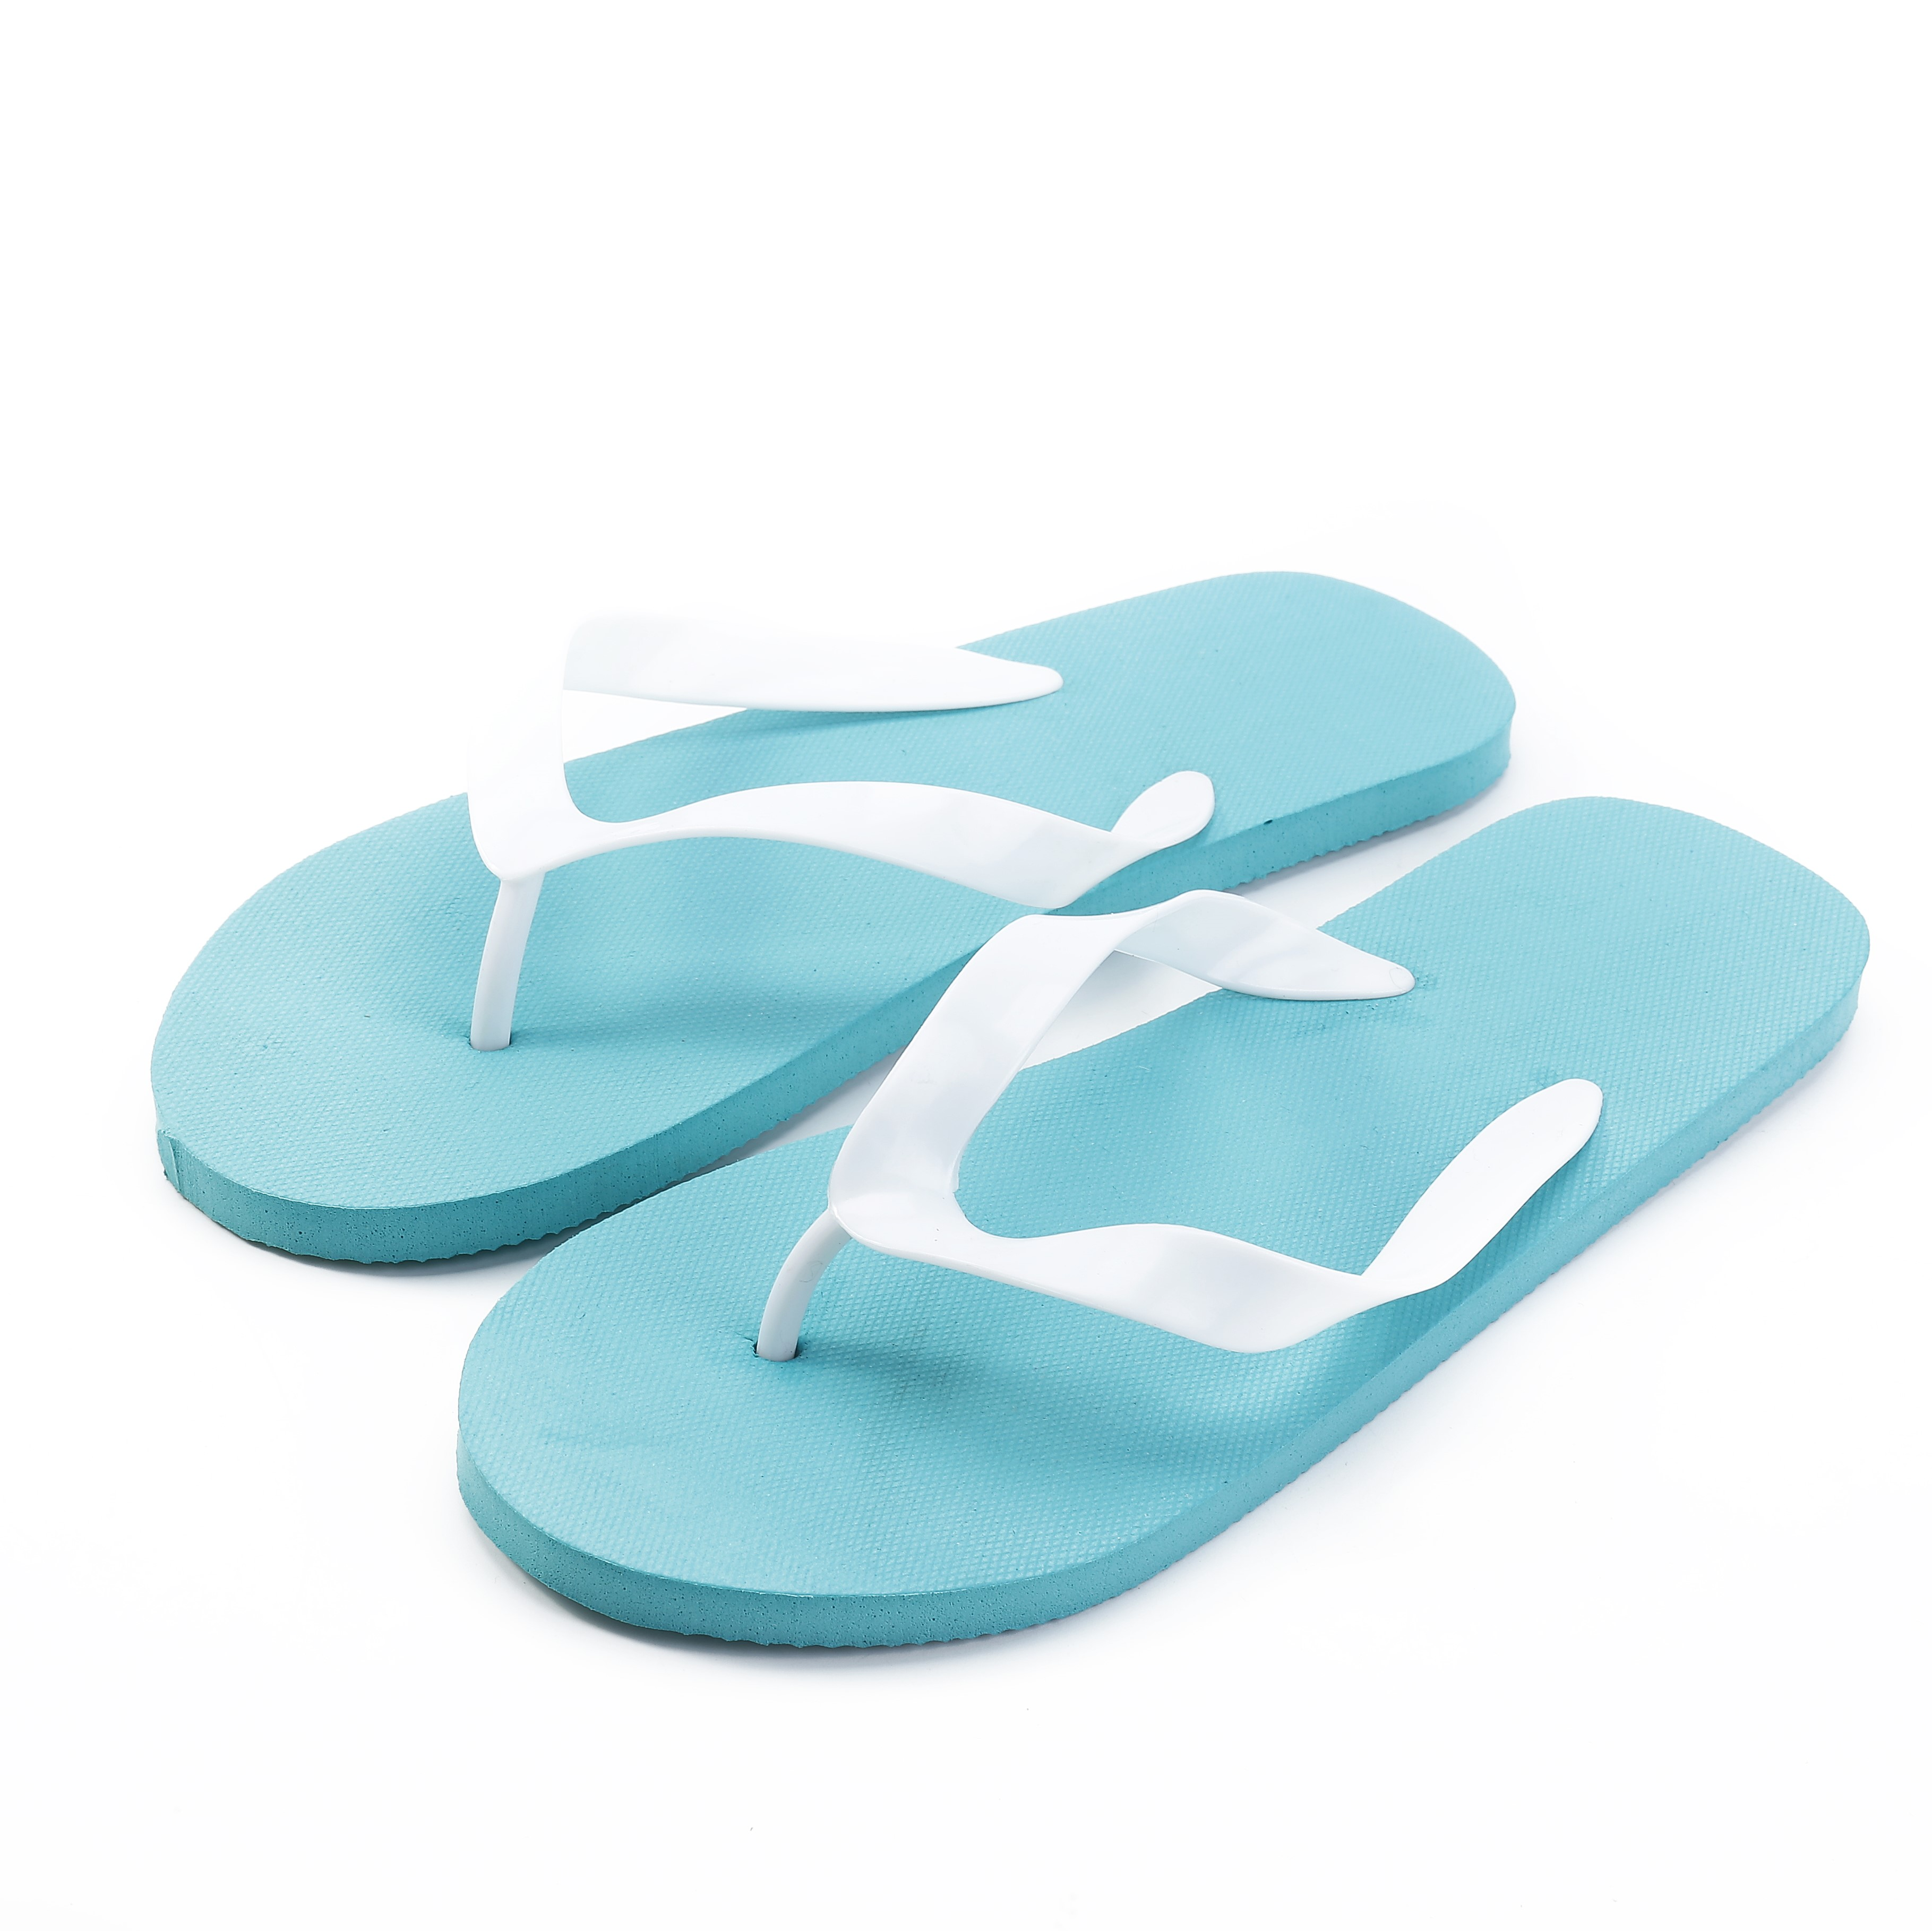 fb5a22274e6c3 China beach slippers wholesale 🇨🇳 - Alibaba